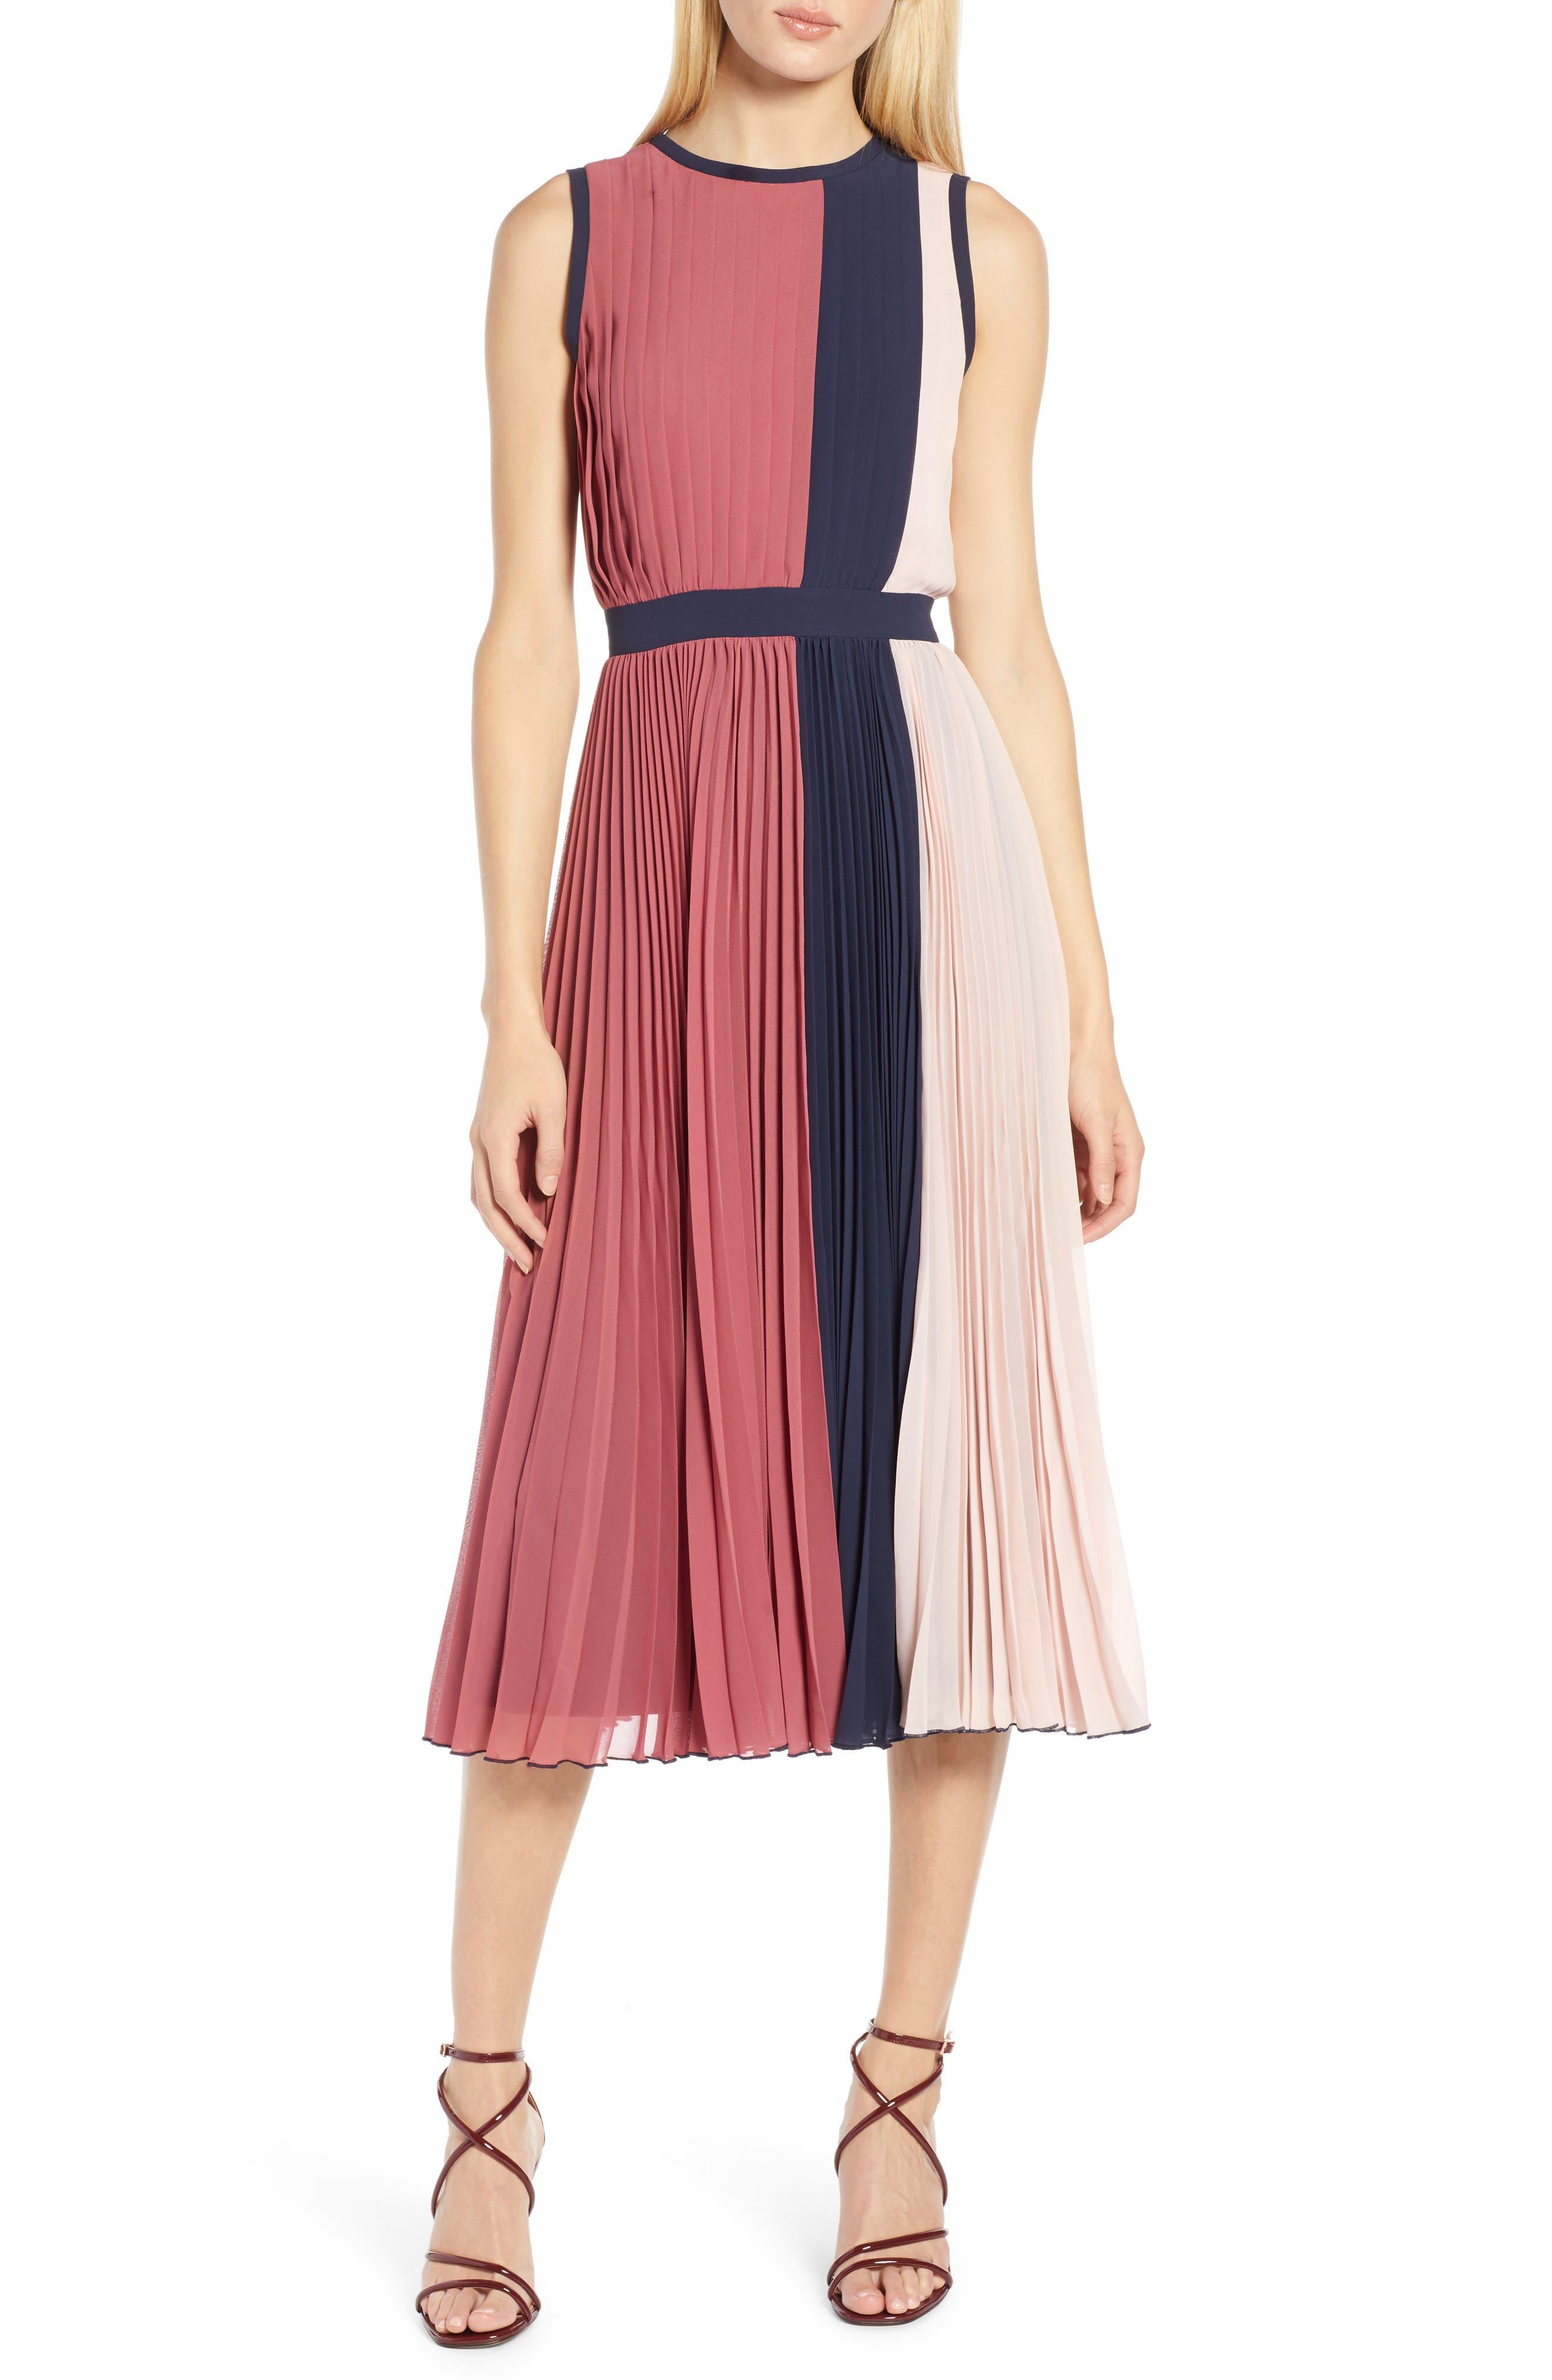 x Atlantic-Pacific Colorblock Pleated Midi Dress,                         Main,                         color, PINK- NAVY COLORBLOCK